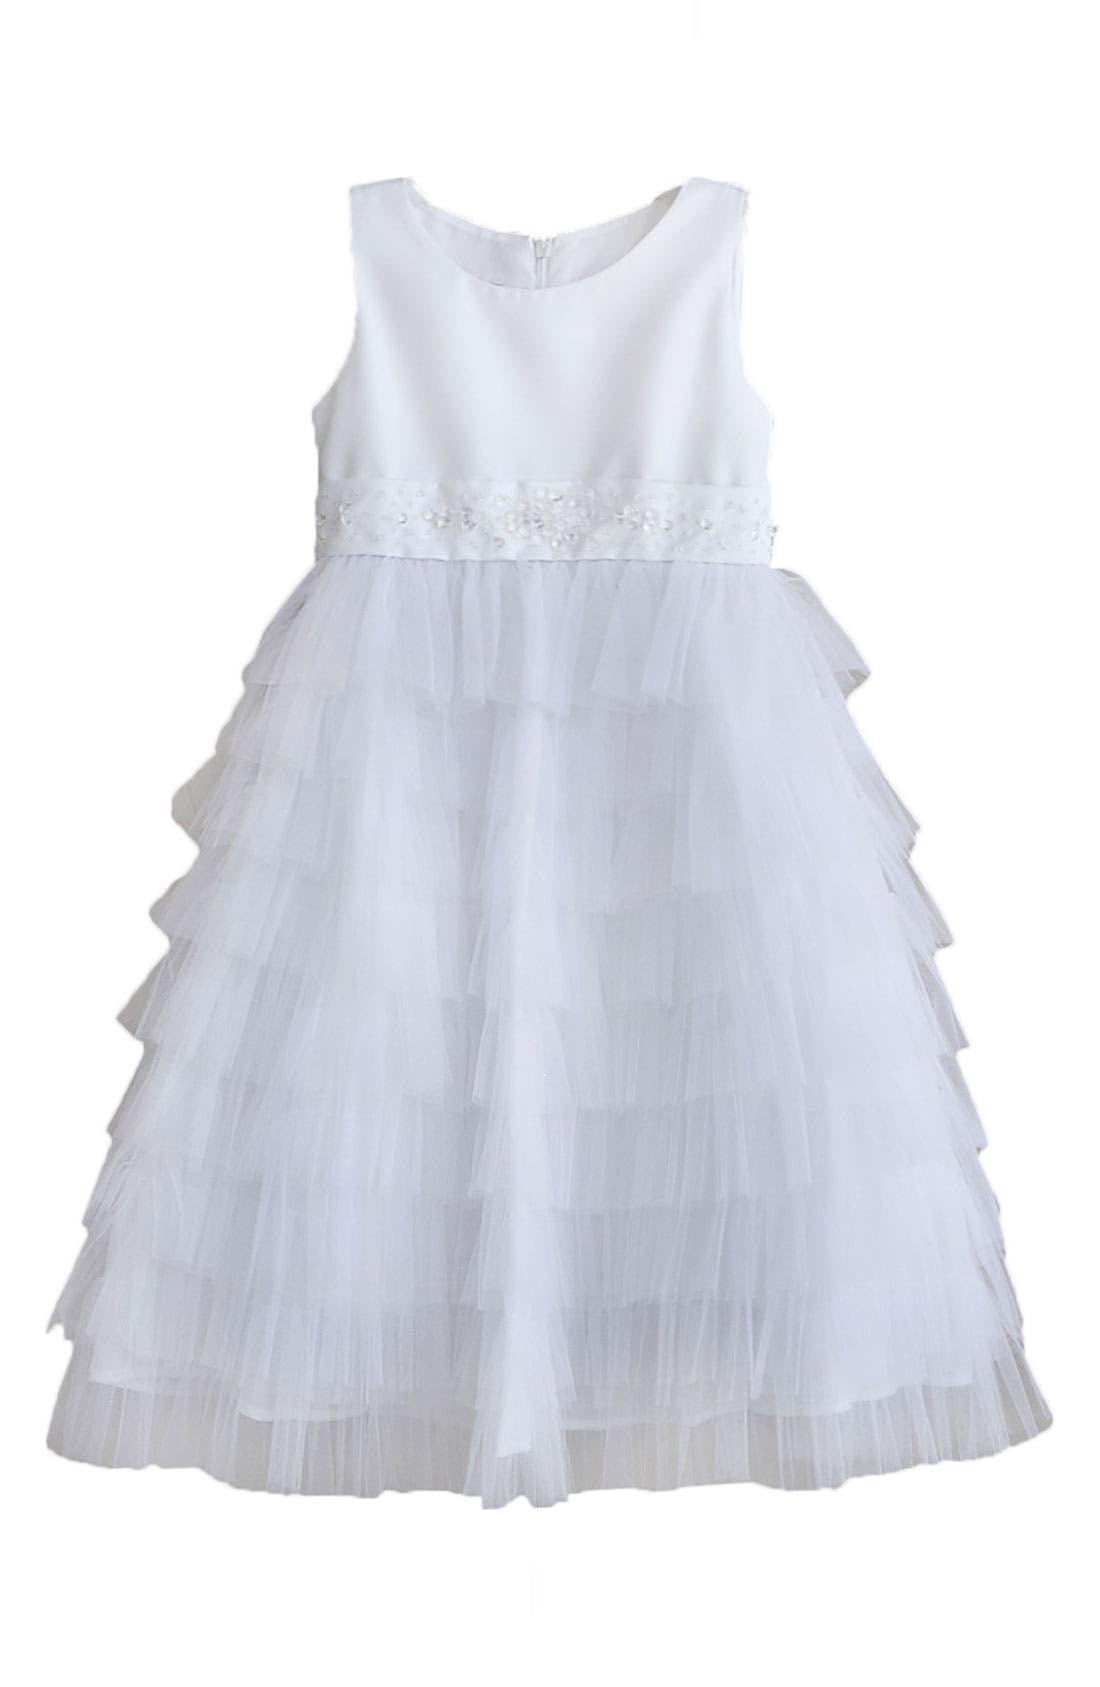 Main Image - Isobella & Chloe Tiered Dress (Little Girls & Big Girls)